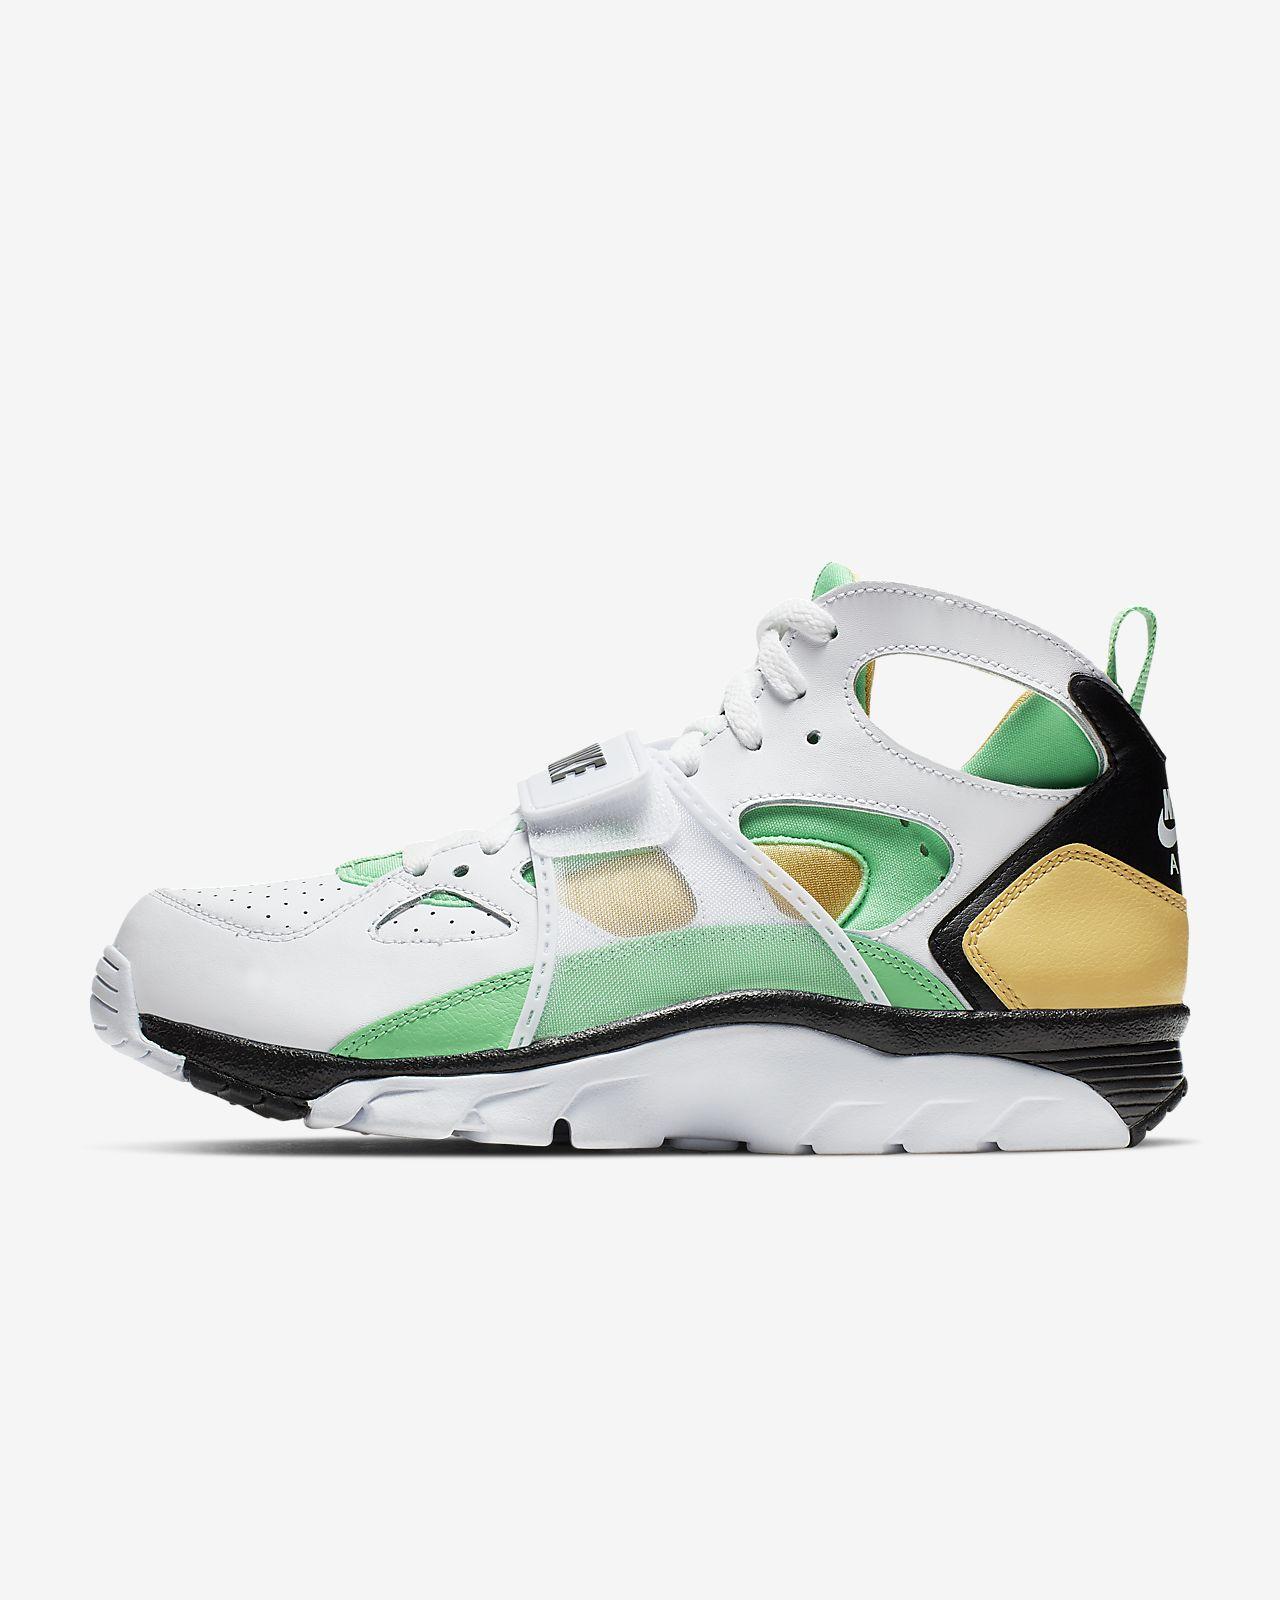 28bd1a1afbfd Nike Air Trainer Huarache Men s Shoe. Nike.com